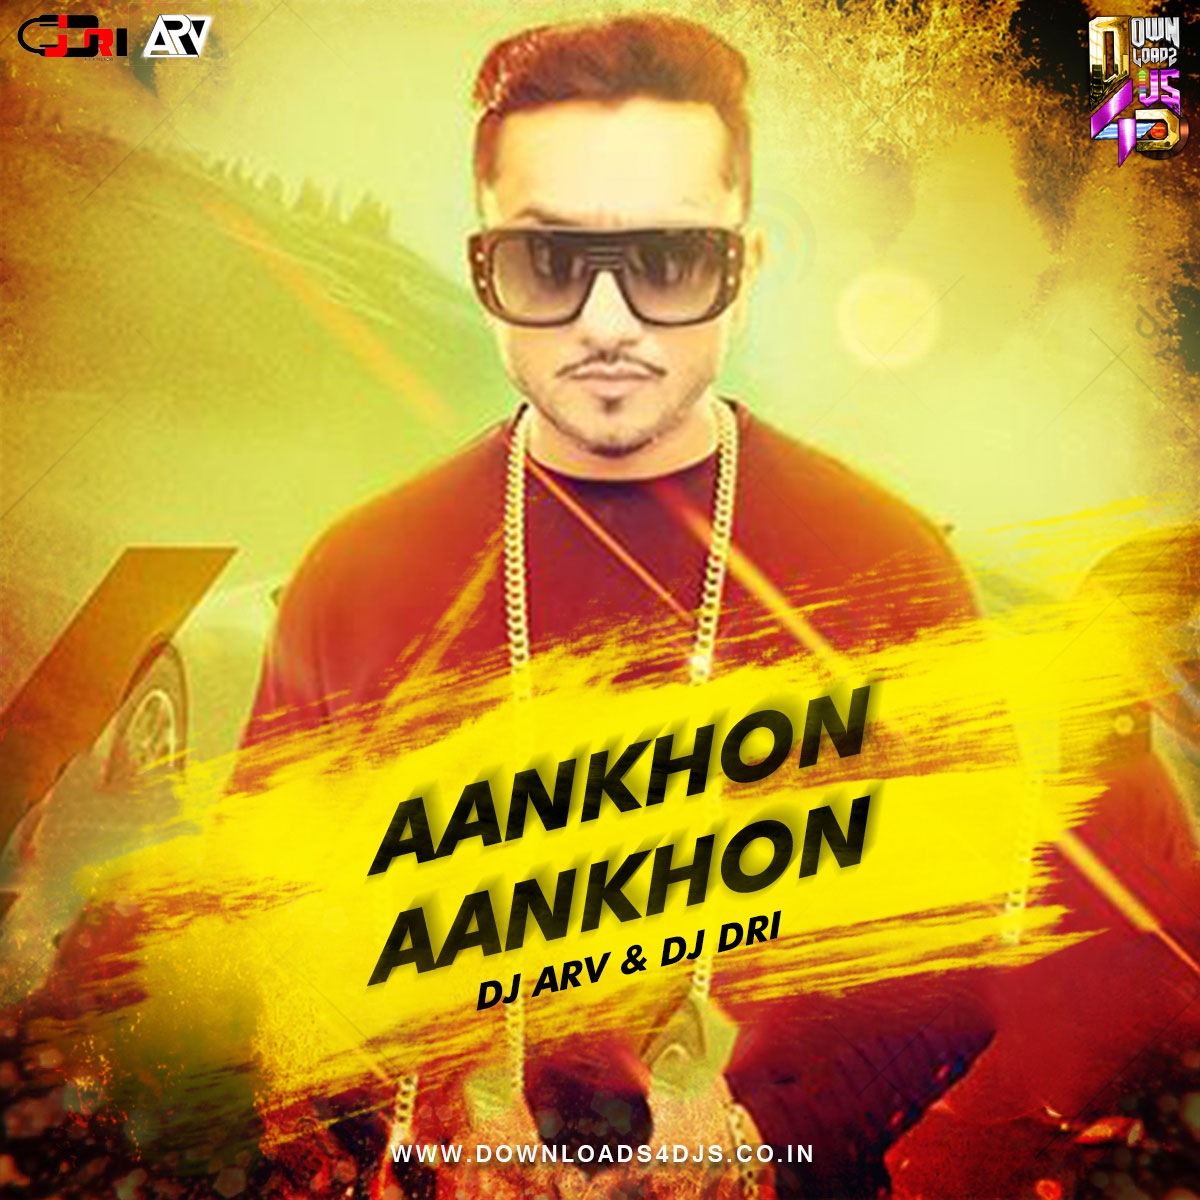 Daru Badnam Dj Remix Sapna: Aankhon Aankhon (Remix)